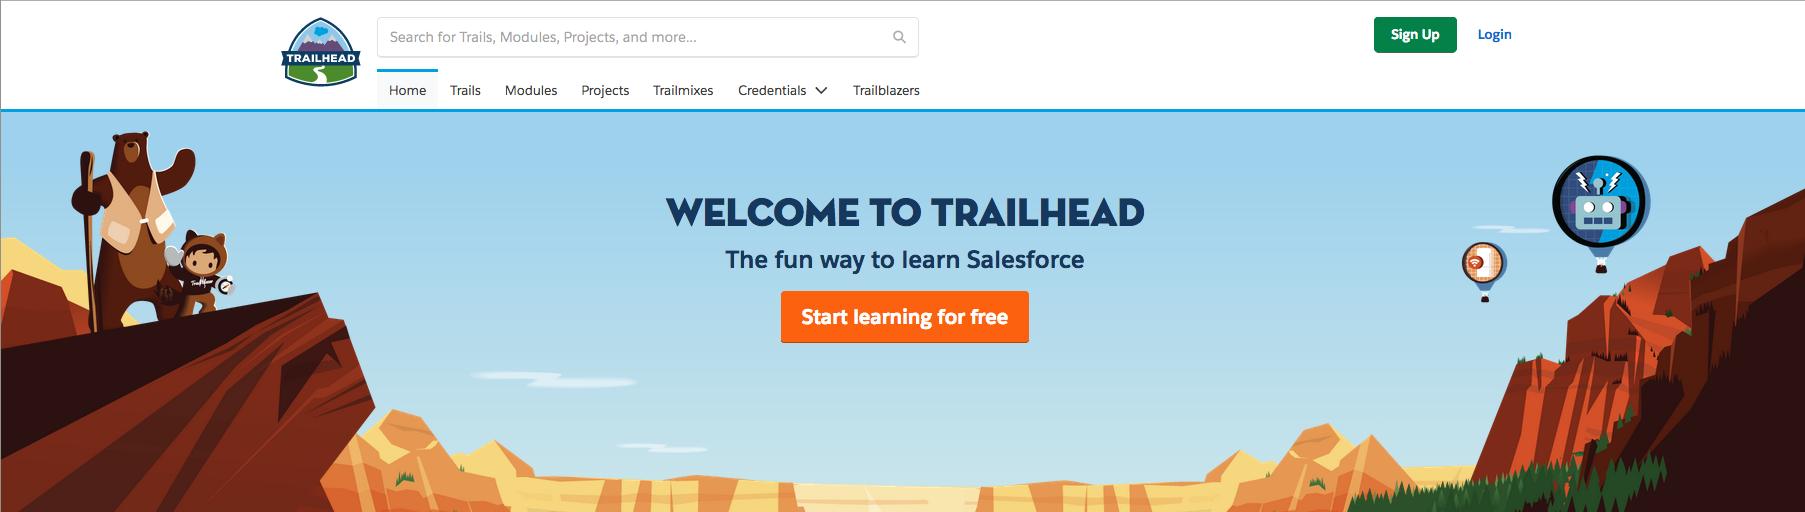 Salesforce Trailhead homepage